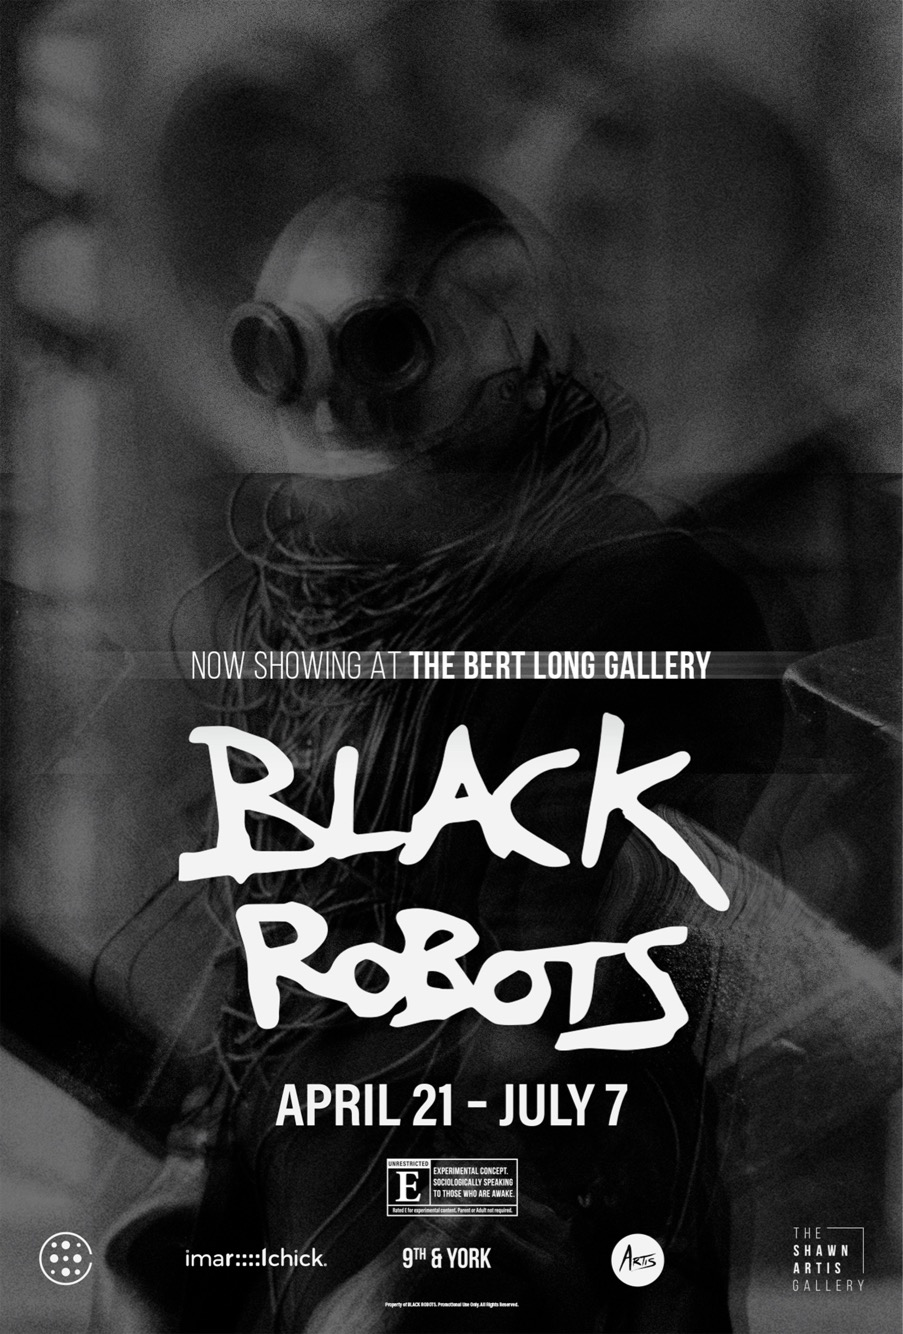 Black robots movie poster.JPG